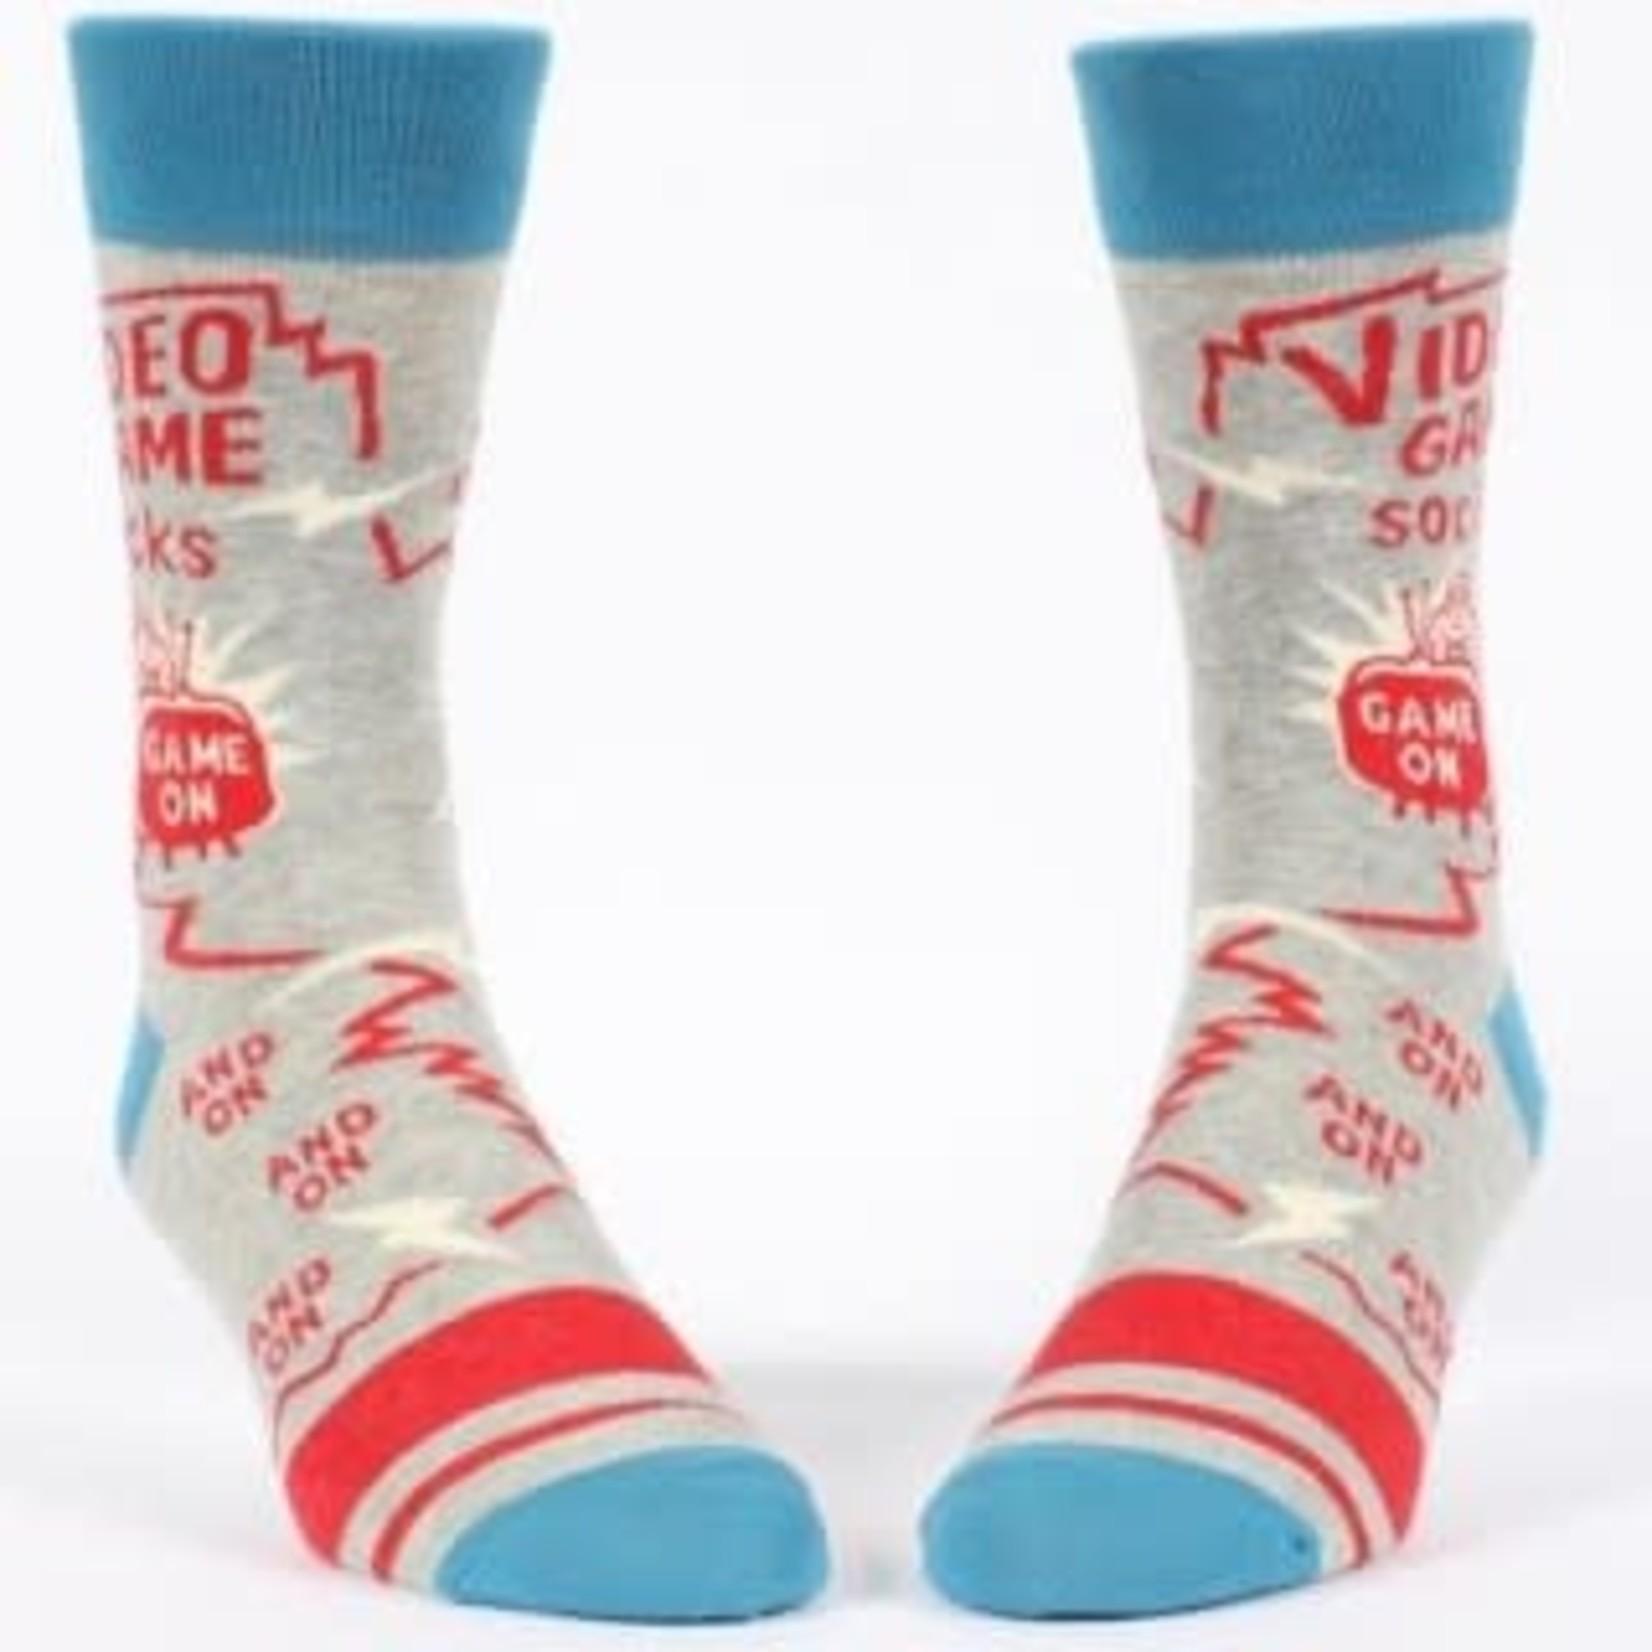 Socks (Mens) - Video Game